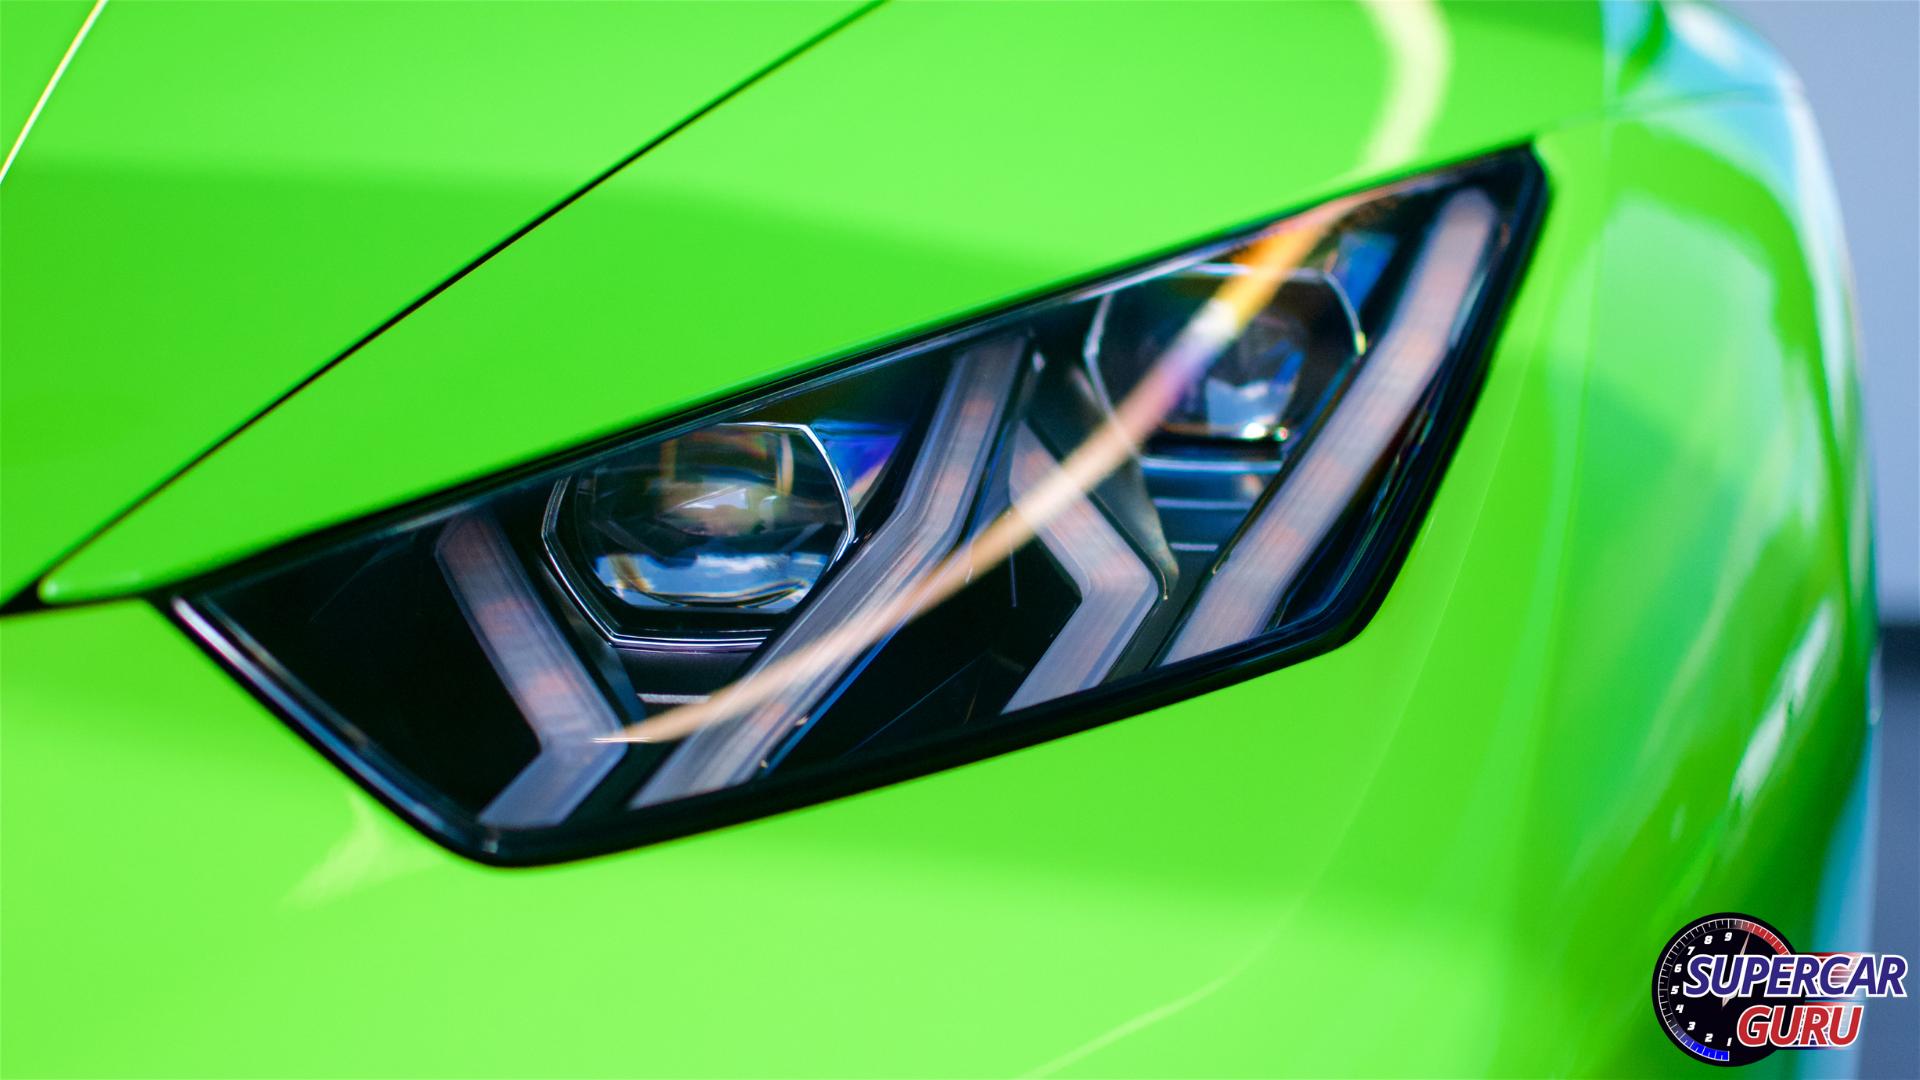 Headlight Super Cars Instagram Photo